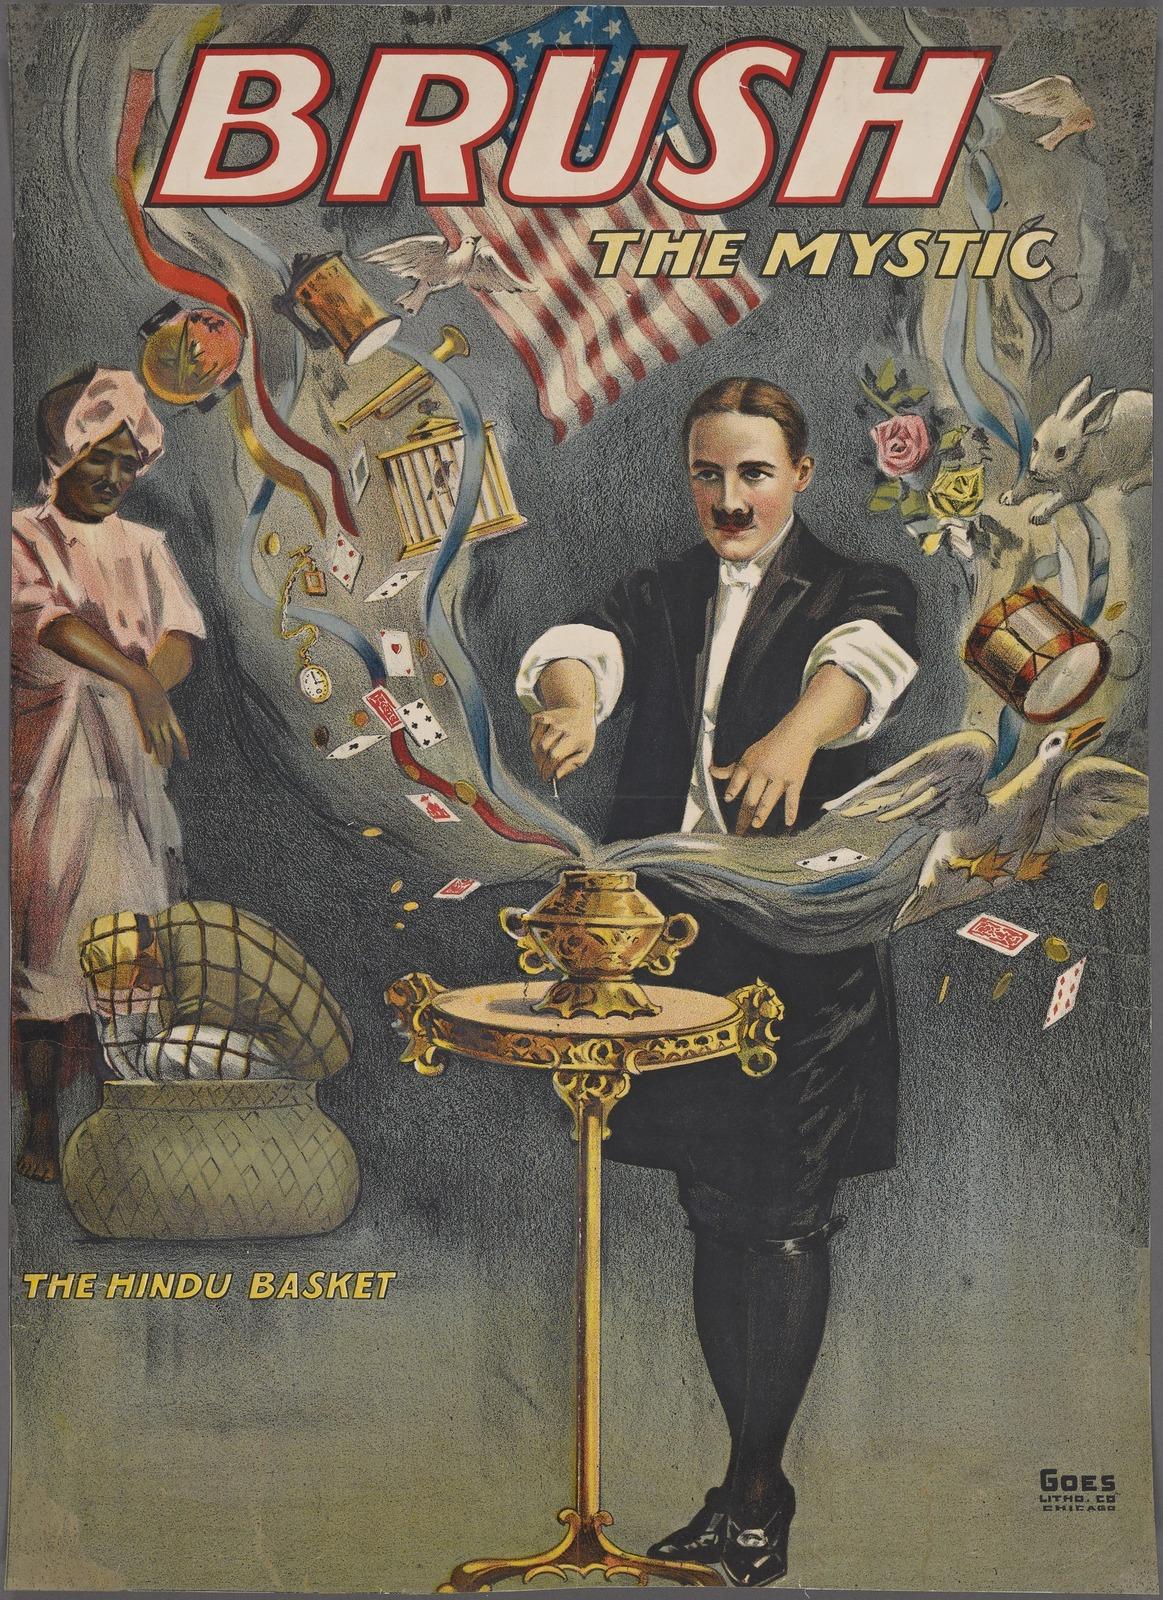 Brush the mystic: the Hindu basket